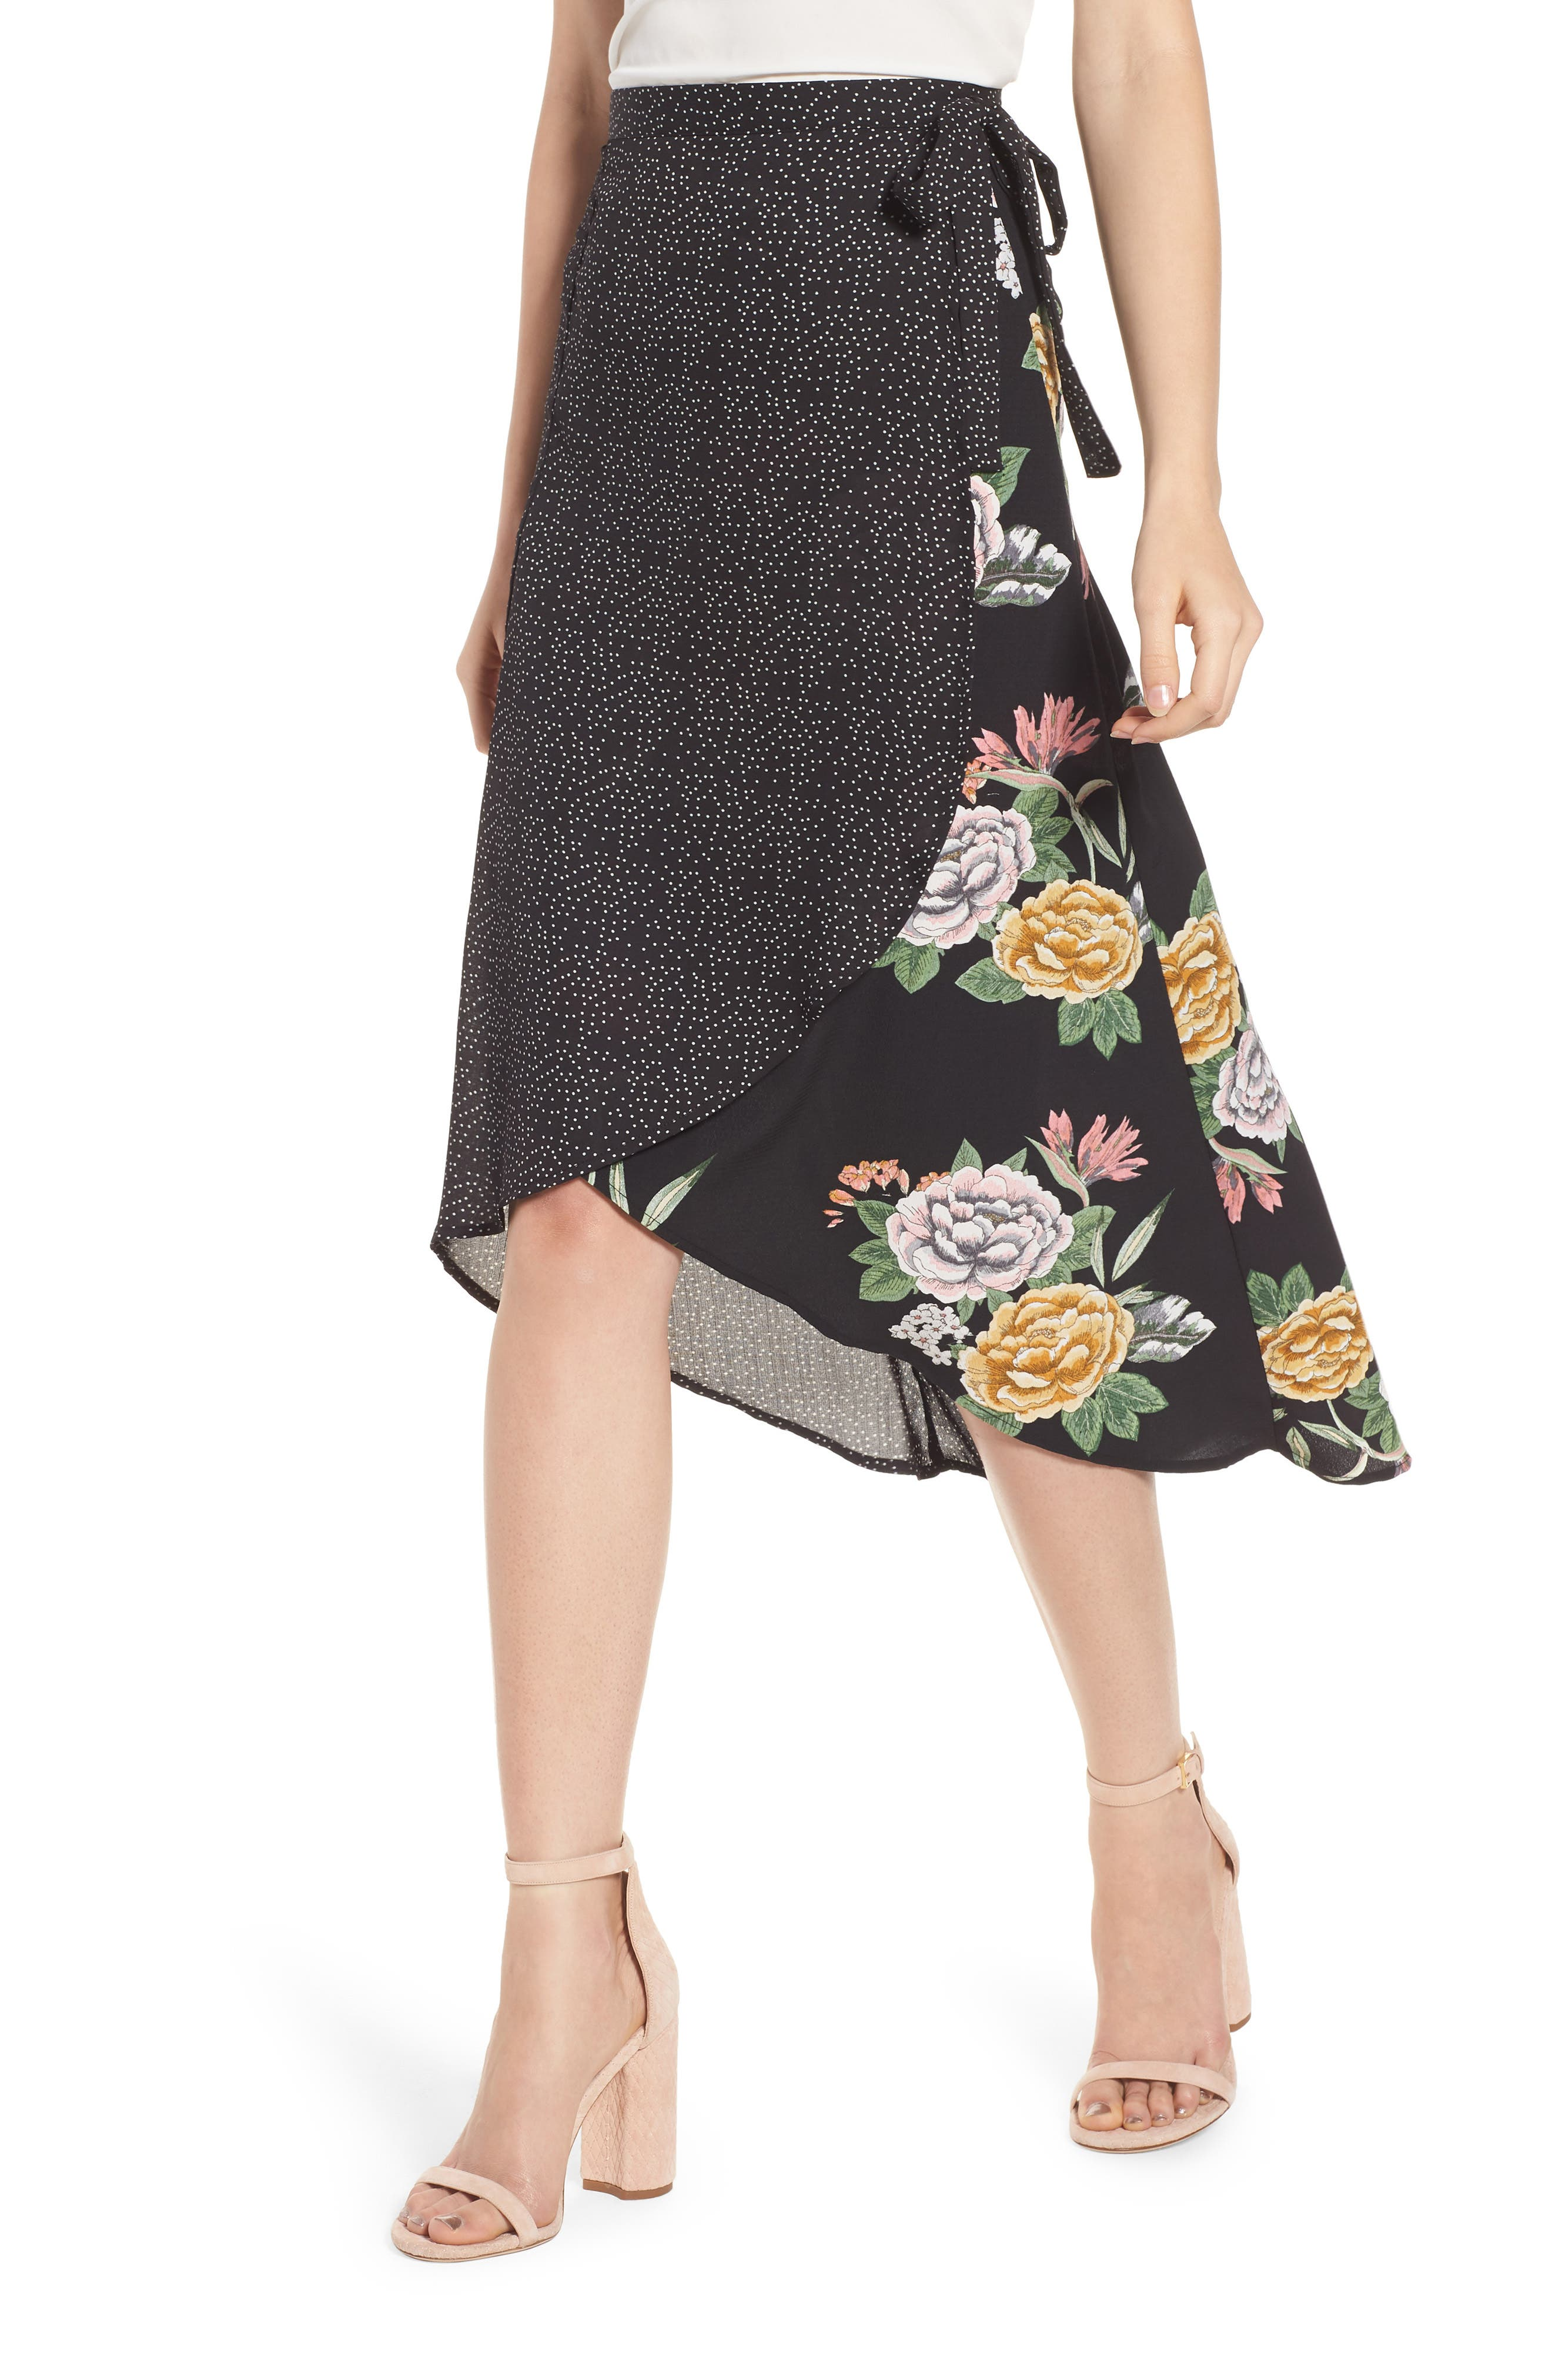 Bishop + Young Enchanted Garden Mix Media Skirt,                         Main,                         color, ENCHANTED GARDEN PRINT